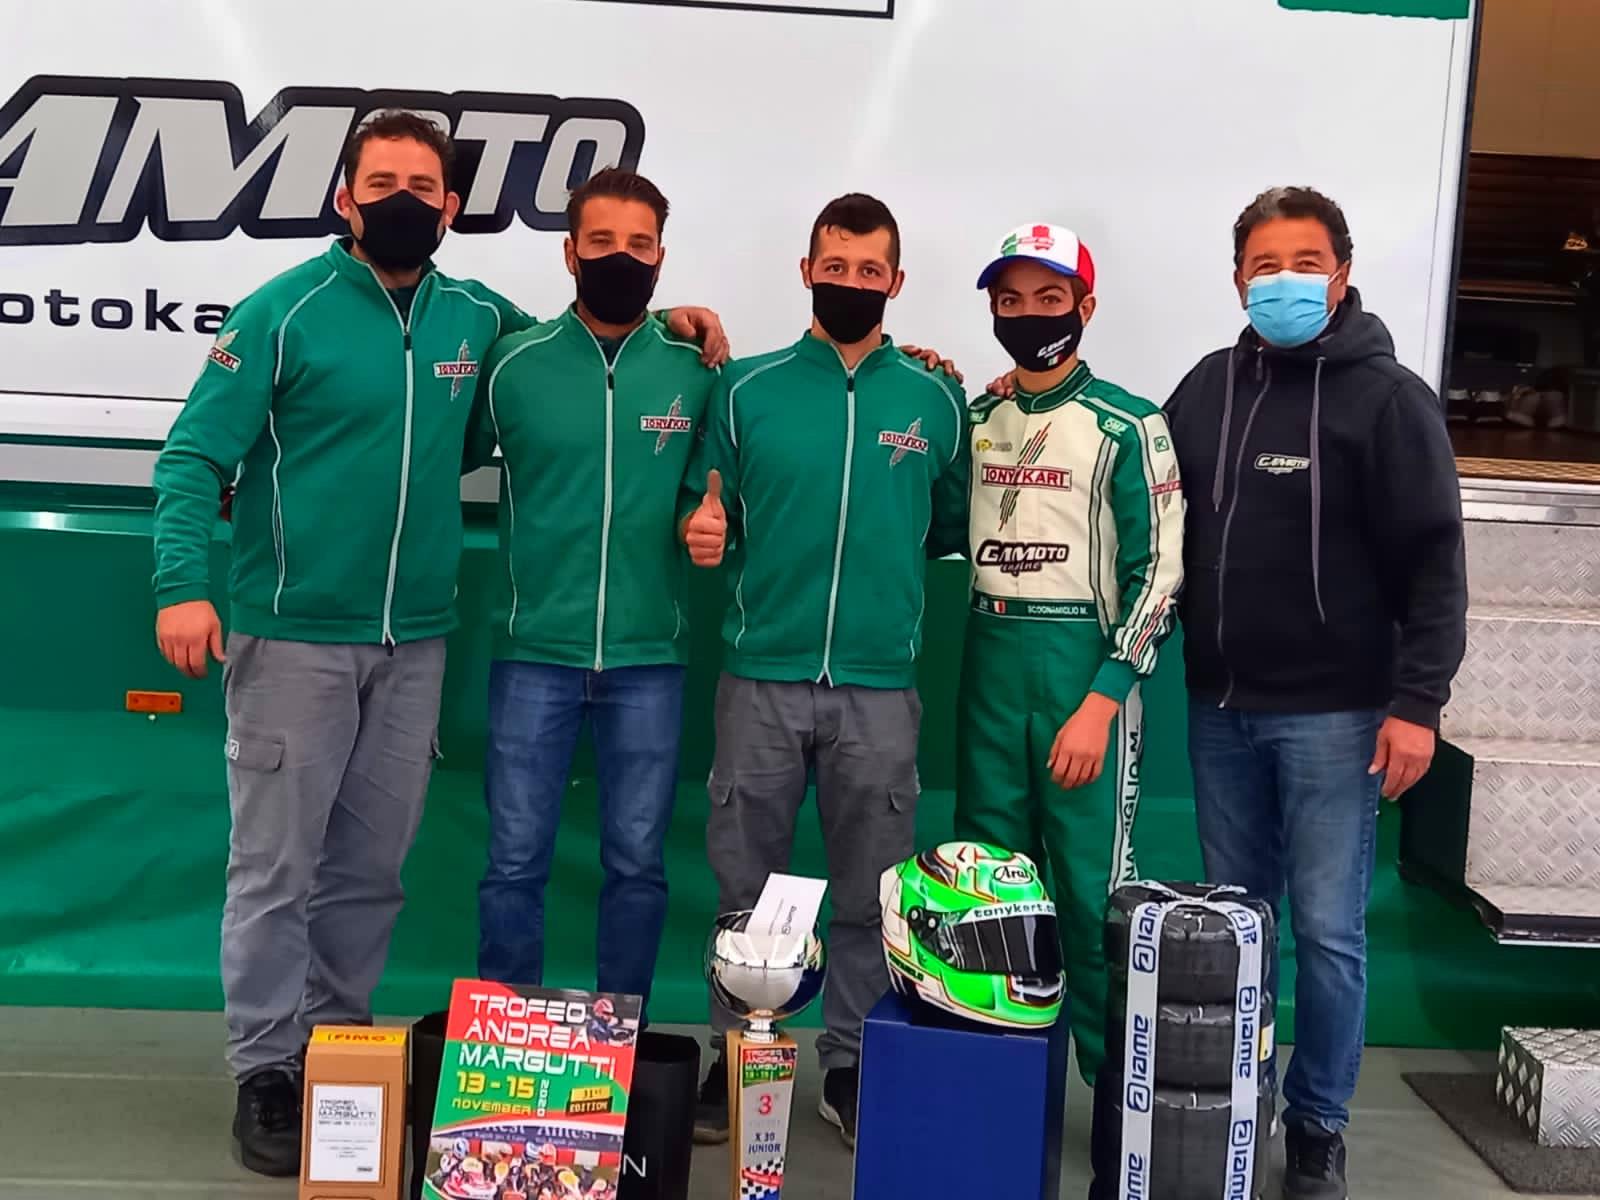 Podium for Gamoto Kart at the Margutti Trophy